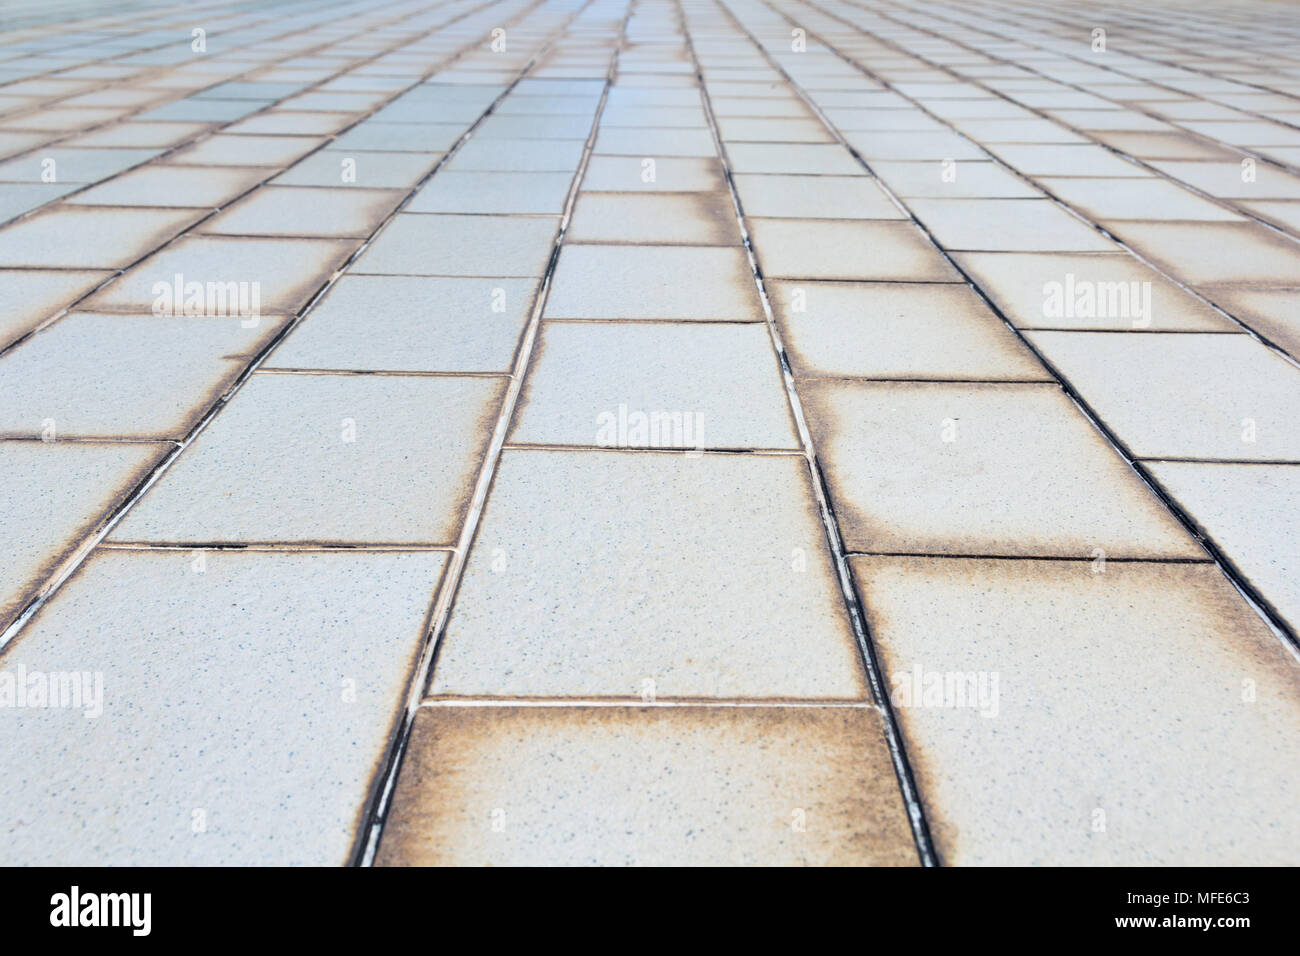 Pavimento piastrelle texture texture porcellana plumage